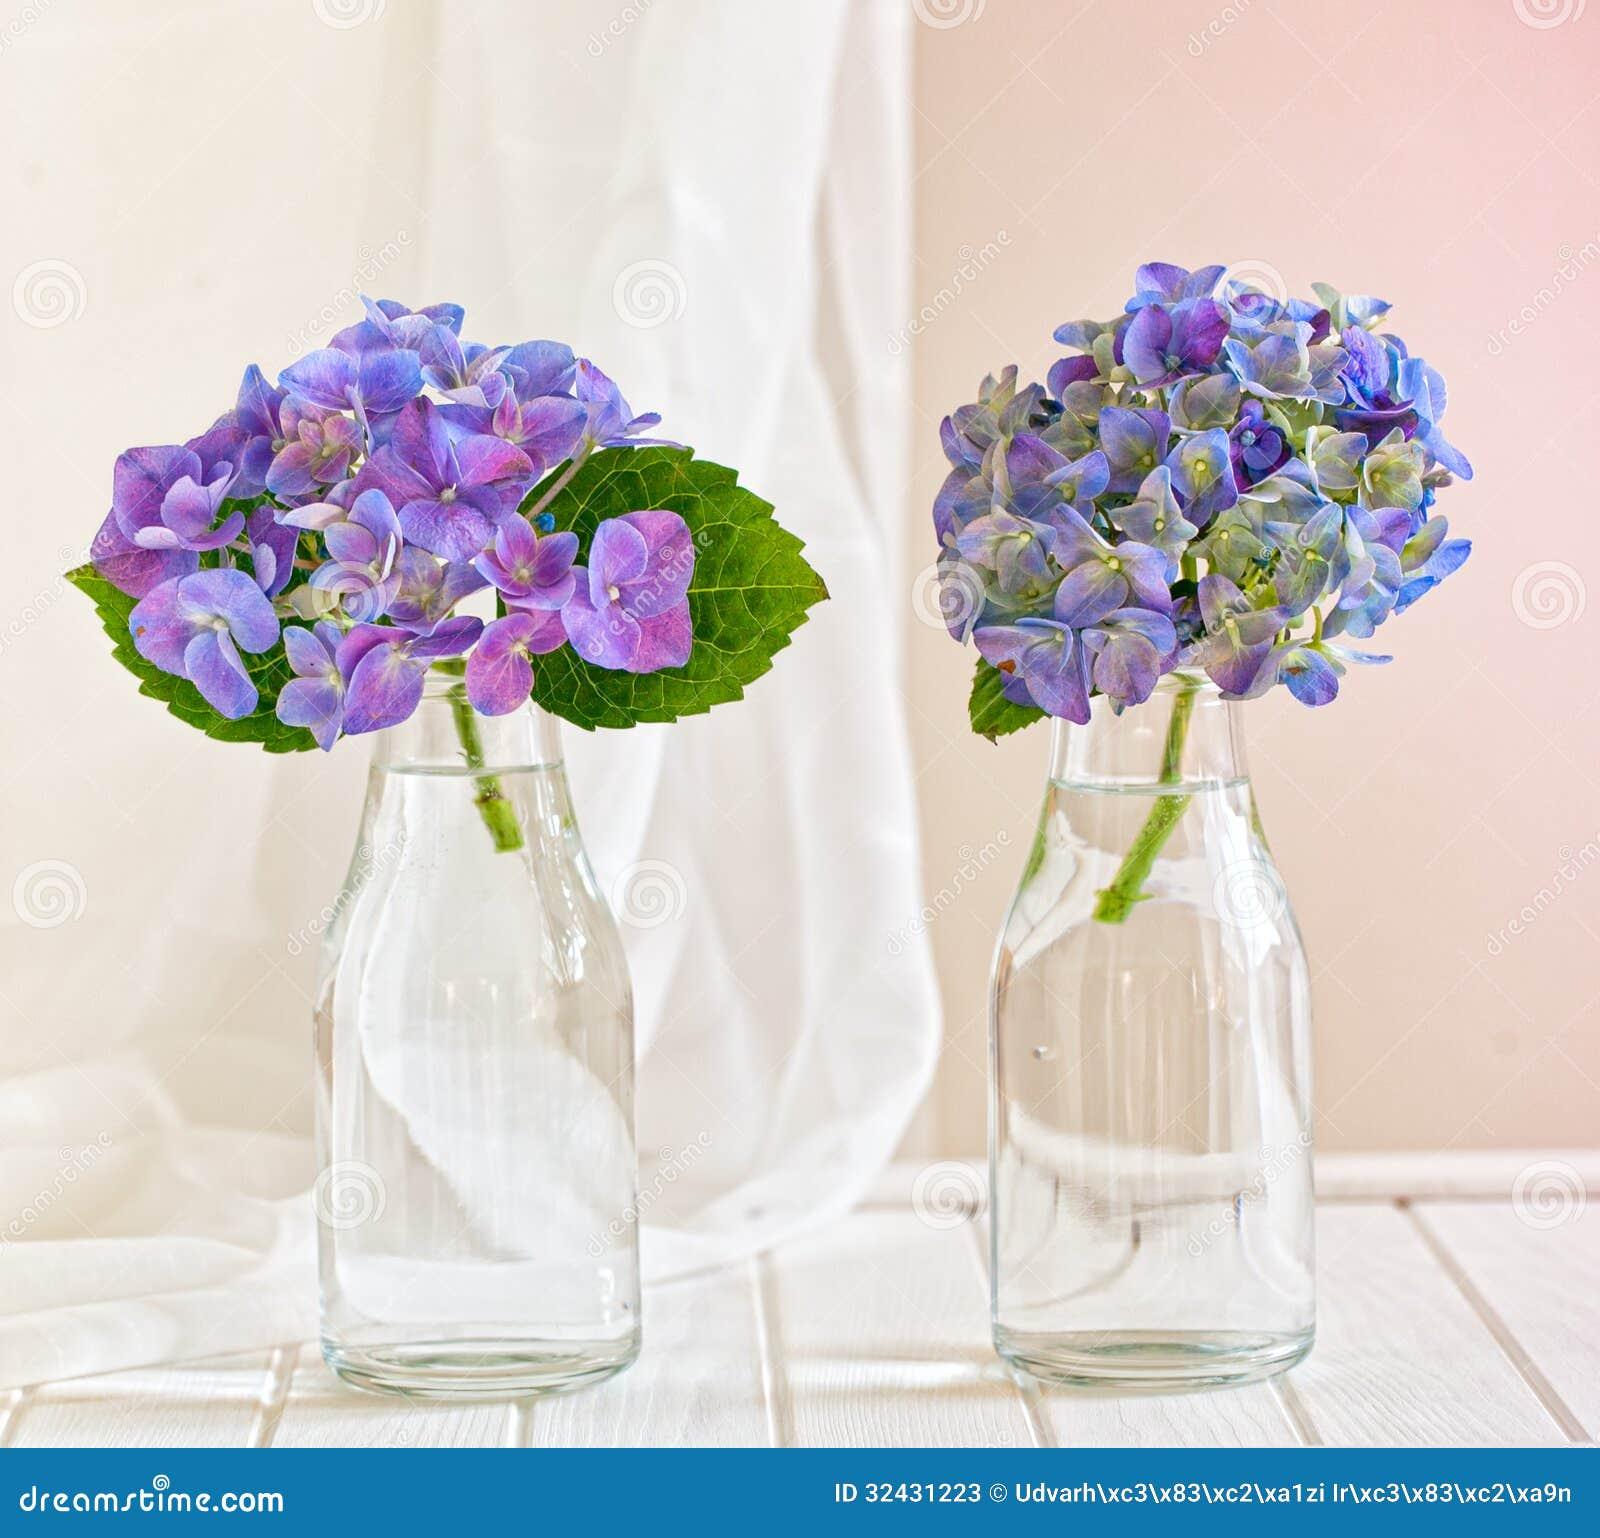 Ortensie Blu : Vasi di vetro con le ortensie blu fotografie stock